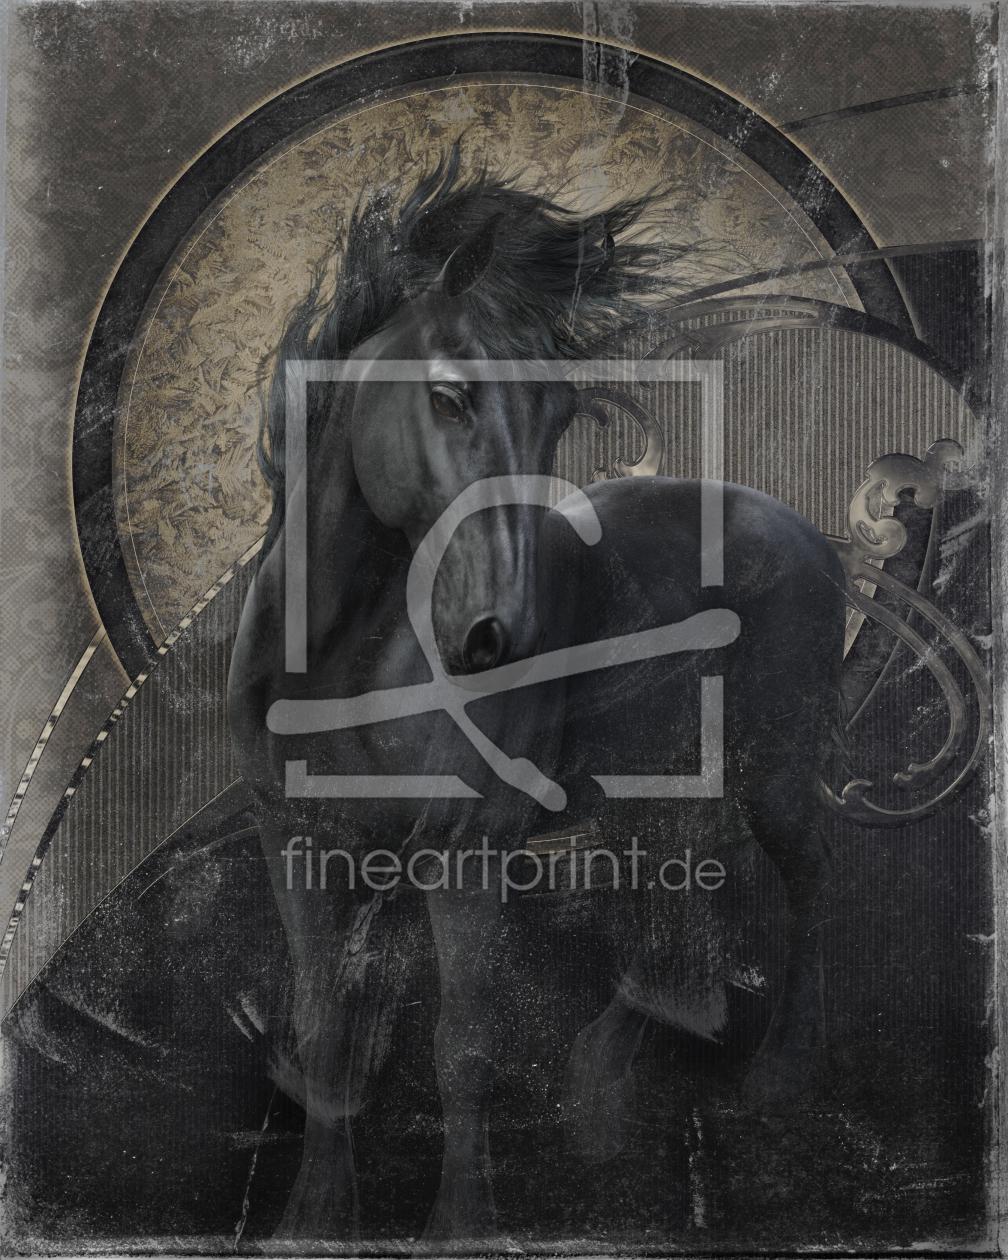 http://www.fineartprint.de/dynimage/bigpreview/0011000000/11518000/11518477.jpg